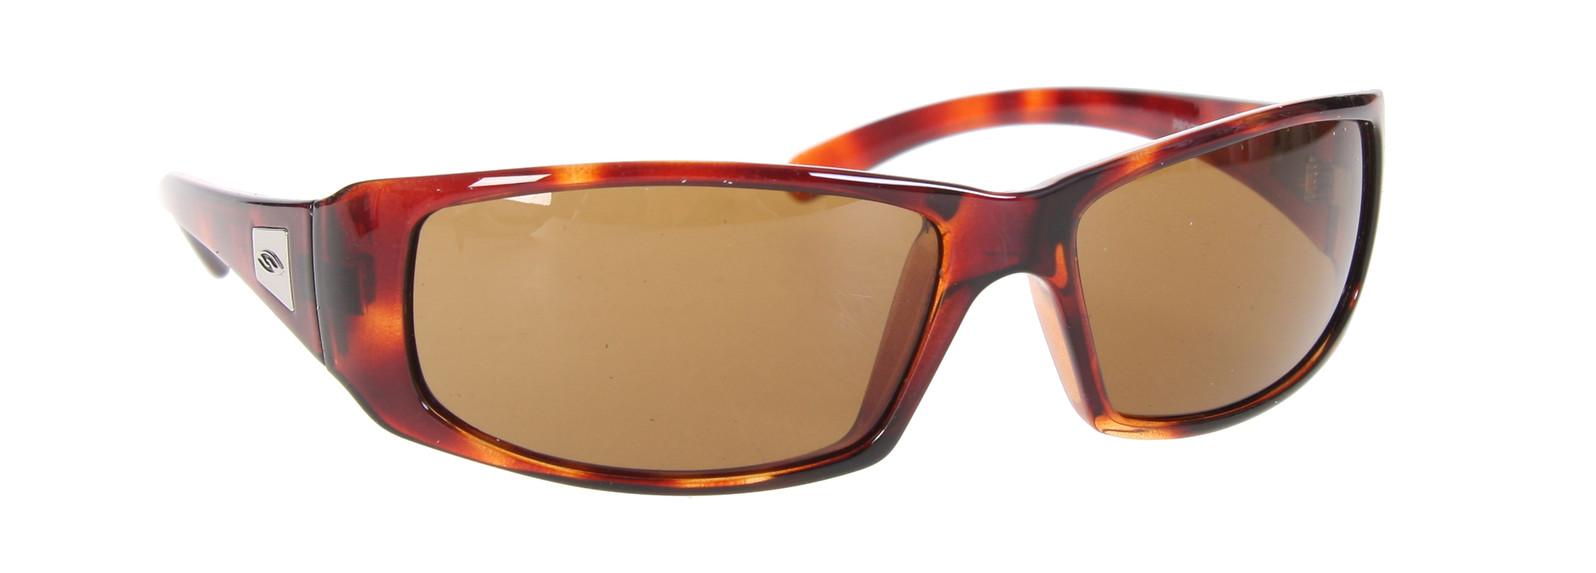 Smith Proof Sunglasses Tortoise/Brown Lens  smith-proof-sngls-tortbrwn-09.jpg